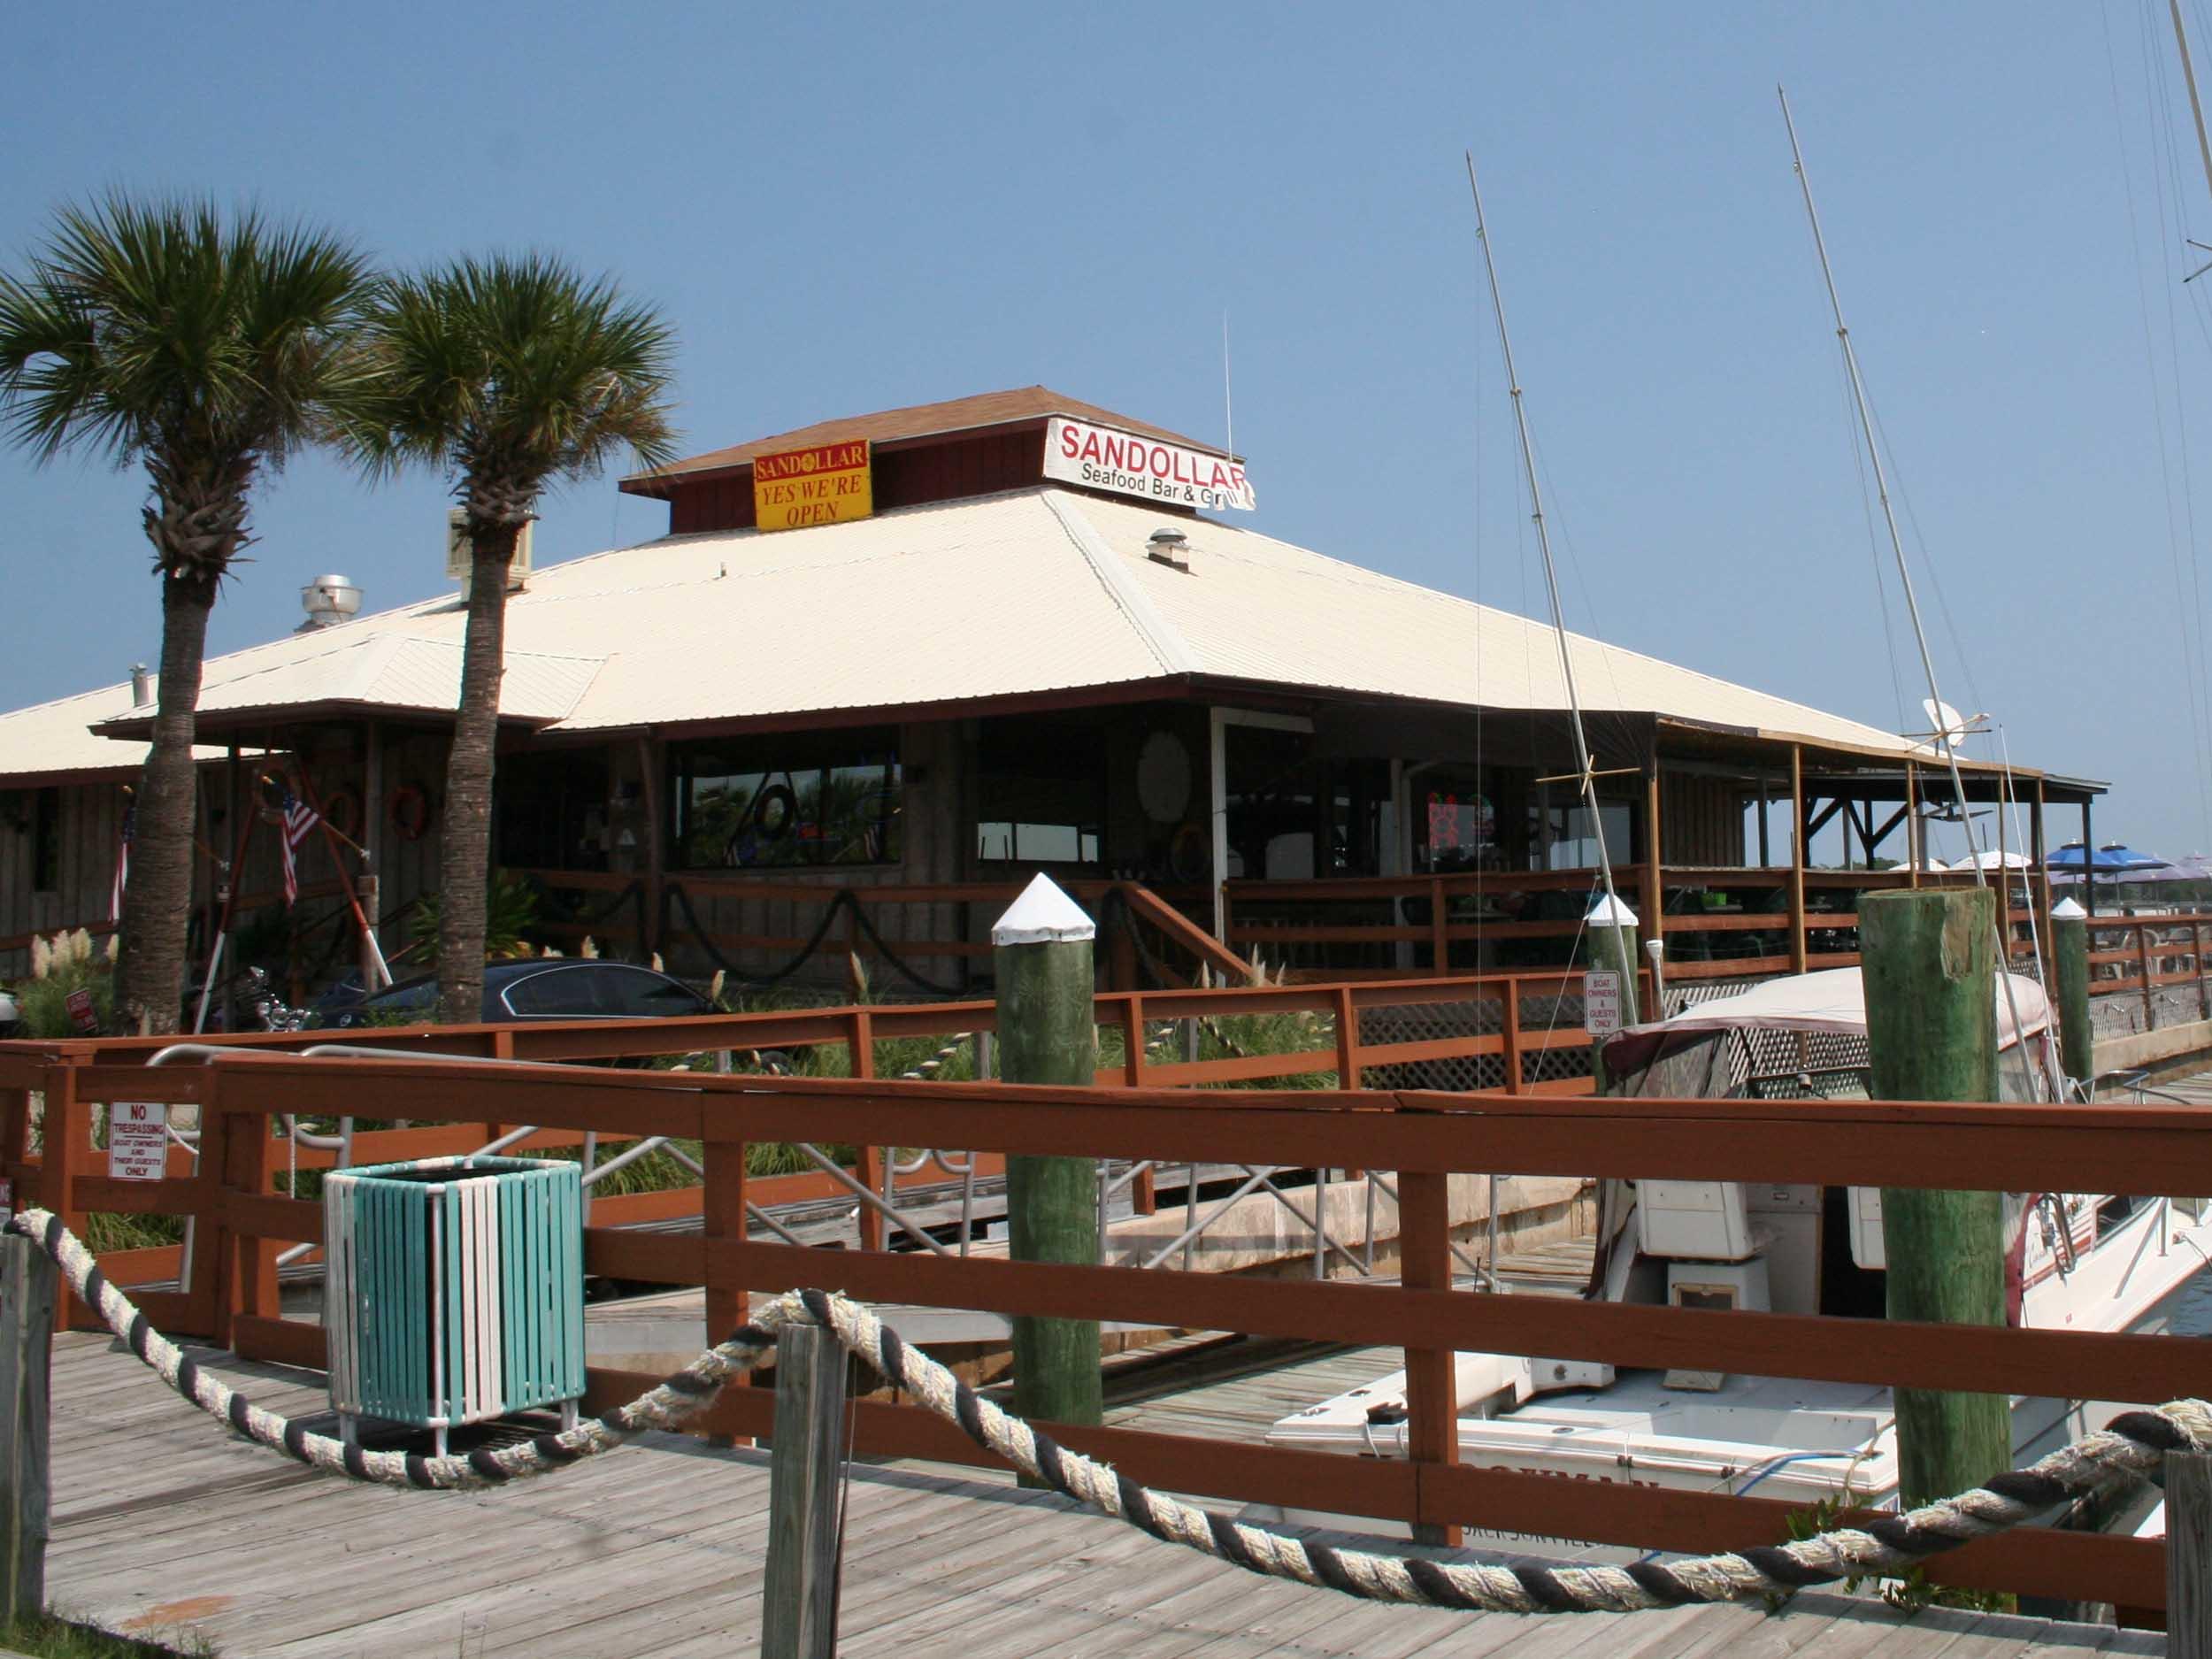 Sandollar Restaurant and Marina Exterior